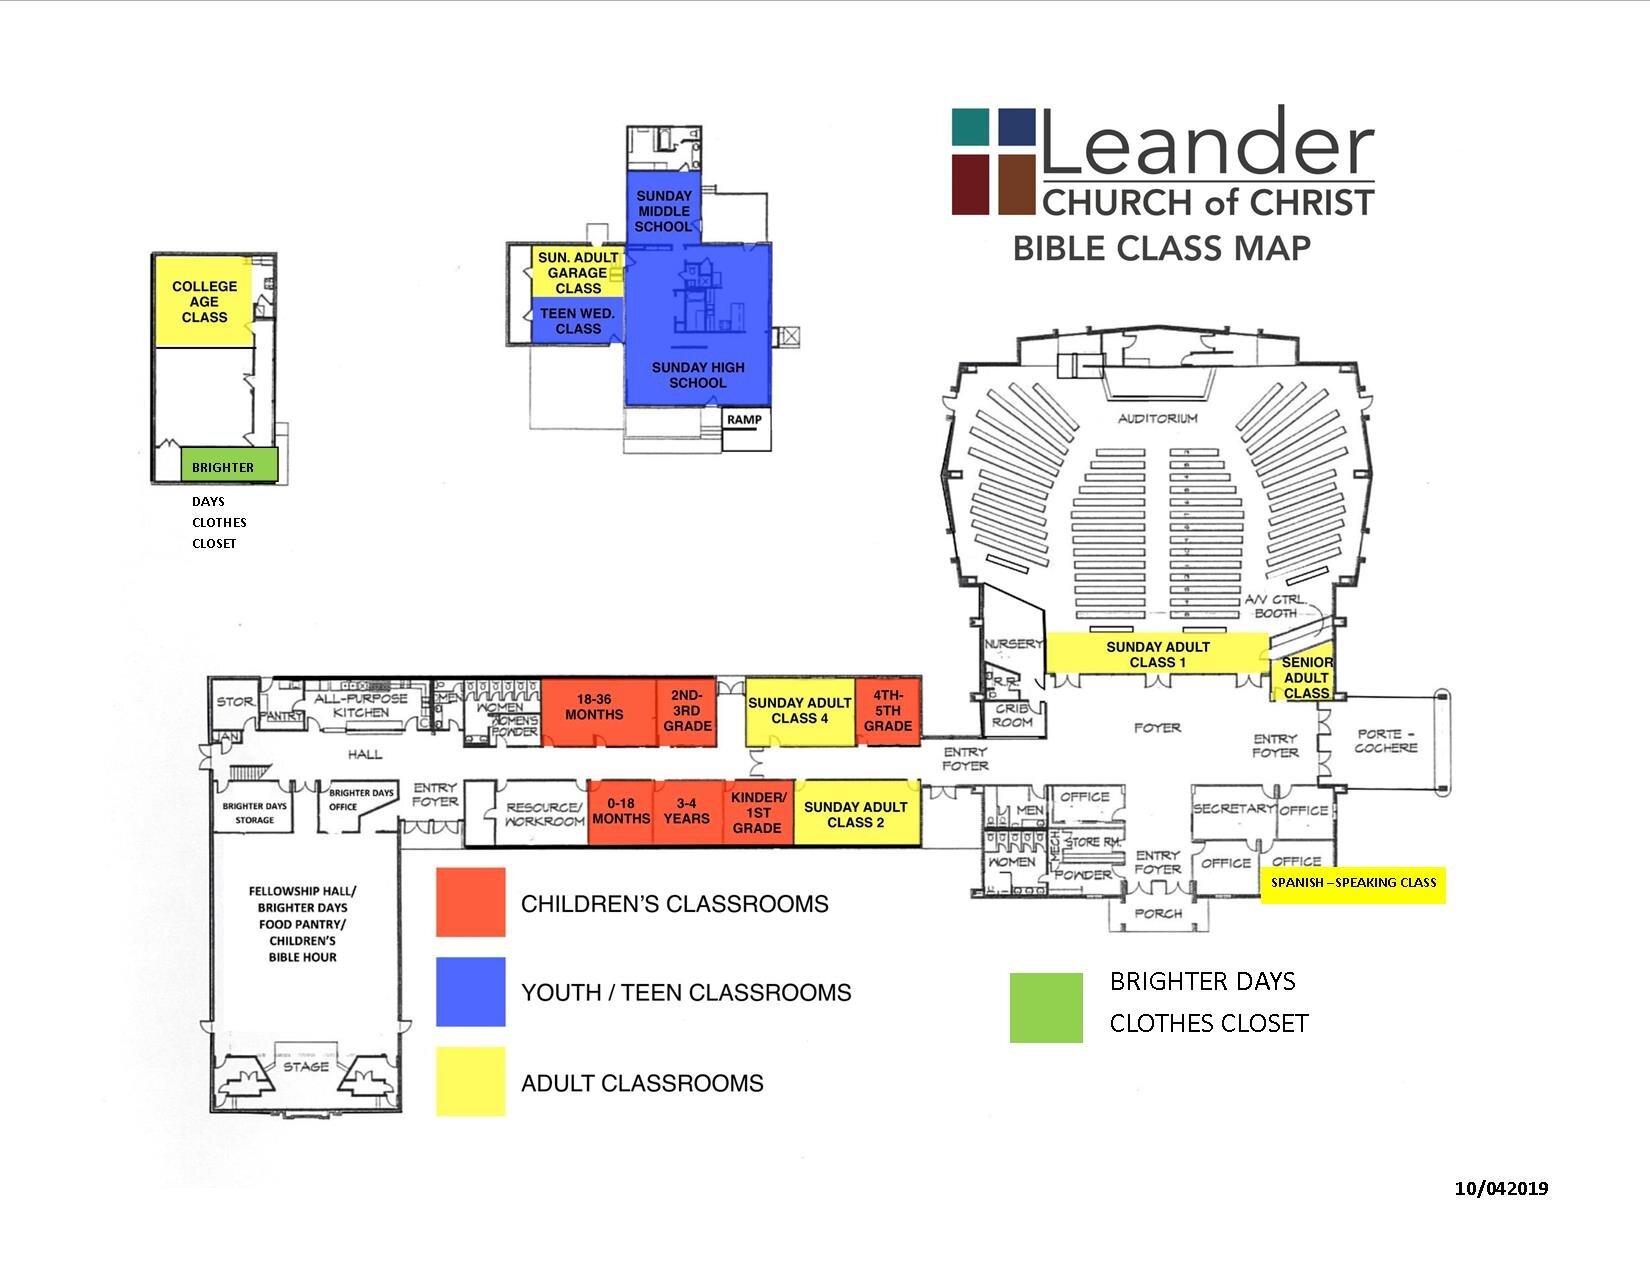 Classroom Map 10-4-2019.jpg